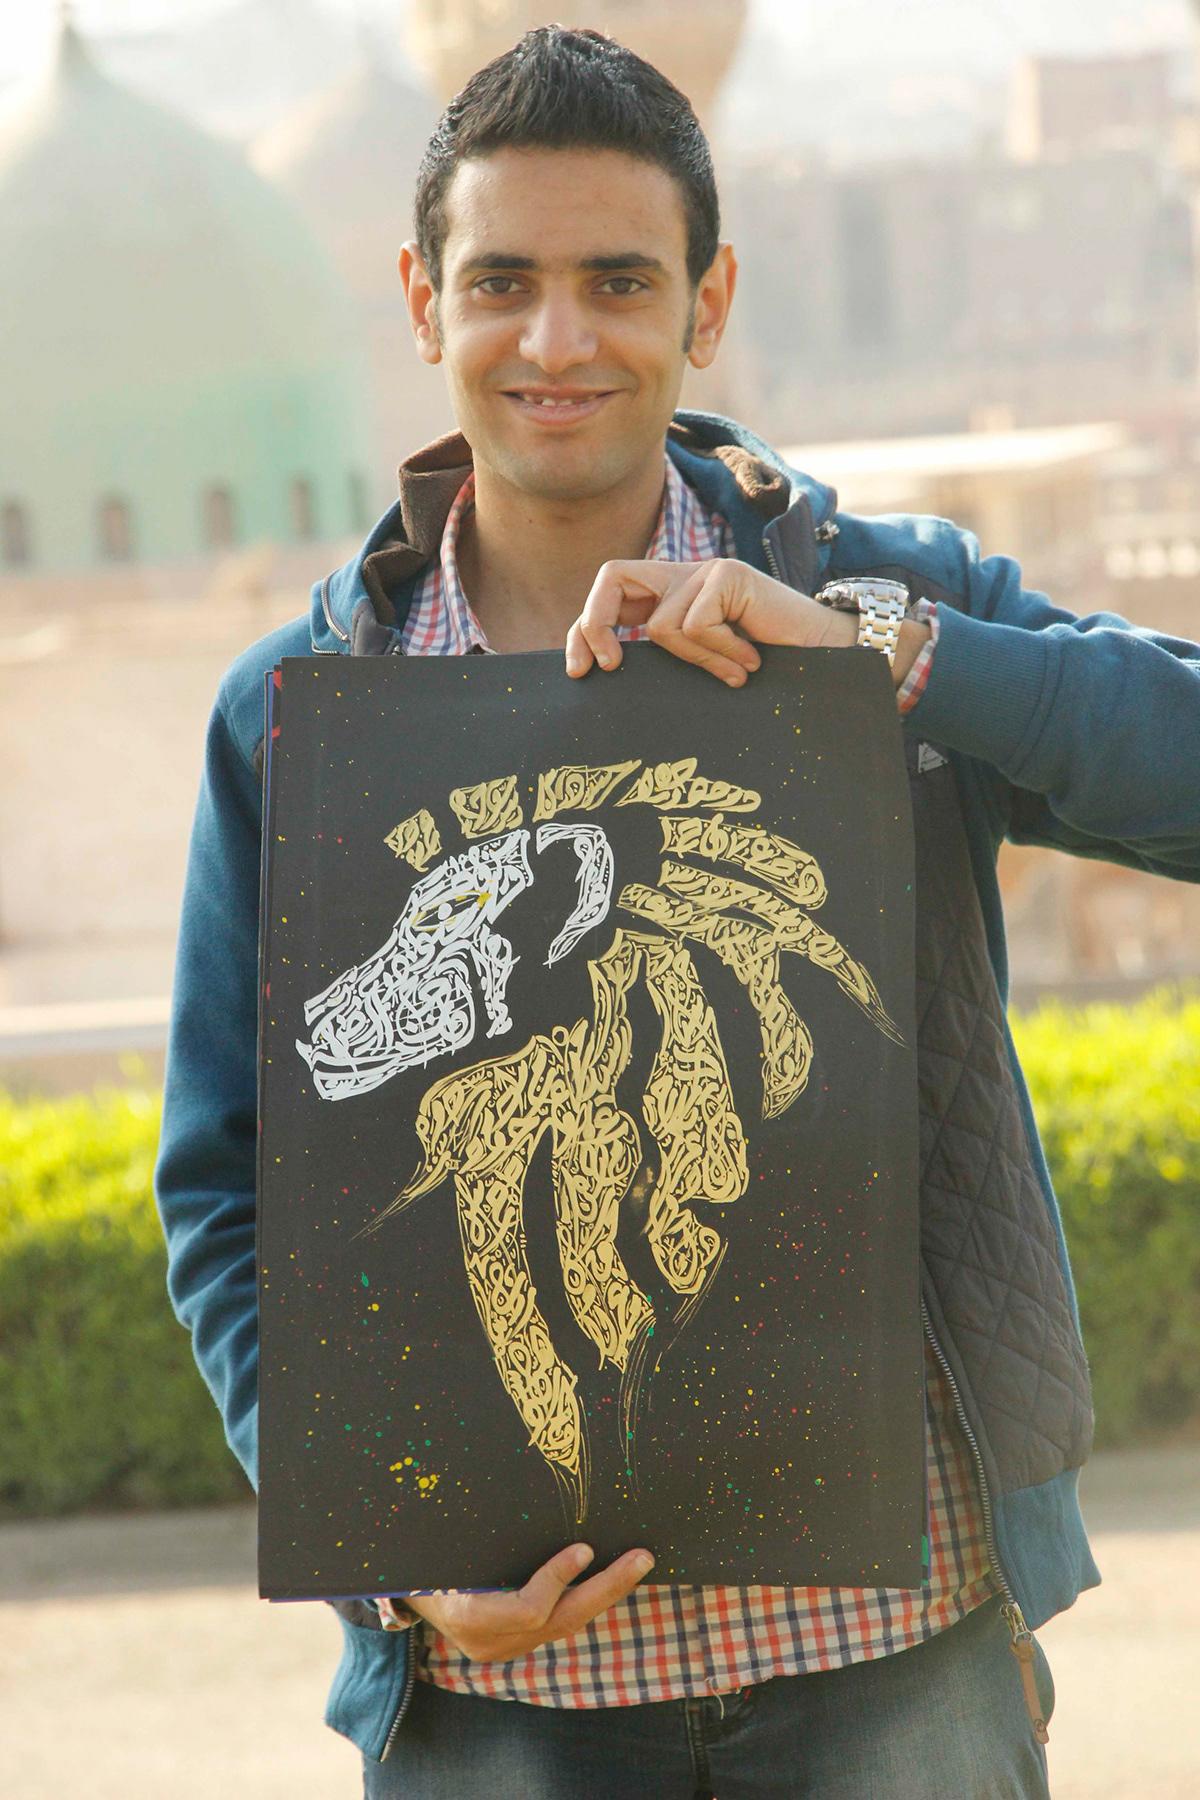 Calligraphy   calligraffiti Caligraffiti Graffiti Arabic Letters art arabic Faris ahmed